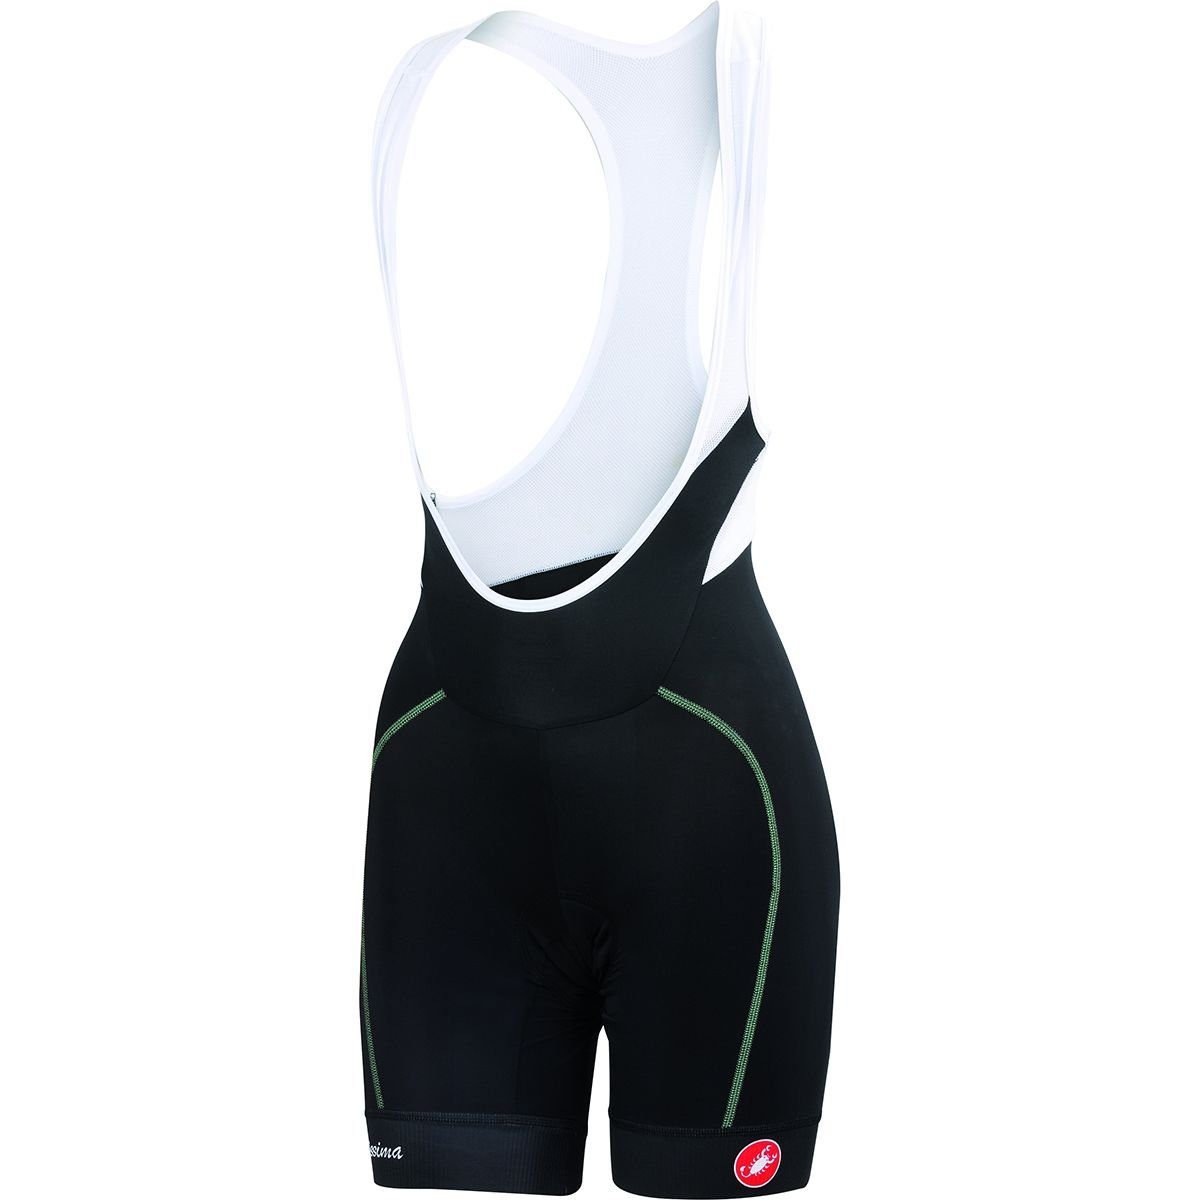 Castelli Cycling Velocissima Women's Bib Short Black/Pastel Mint Small by Castelli (Image #1)